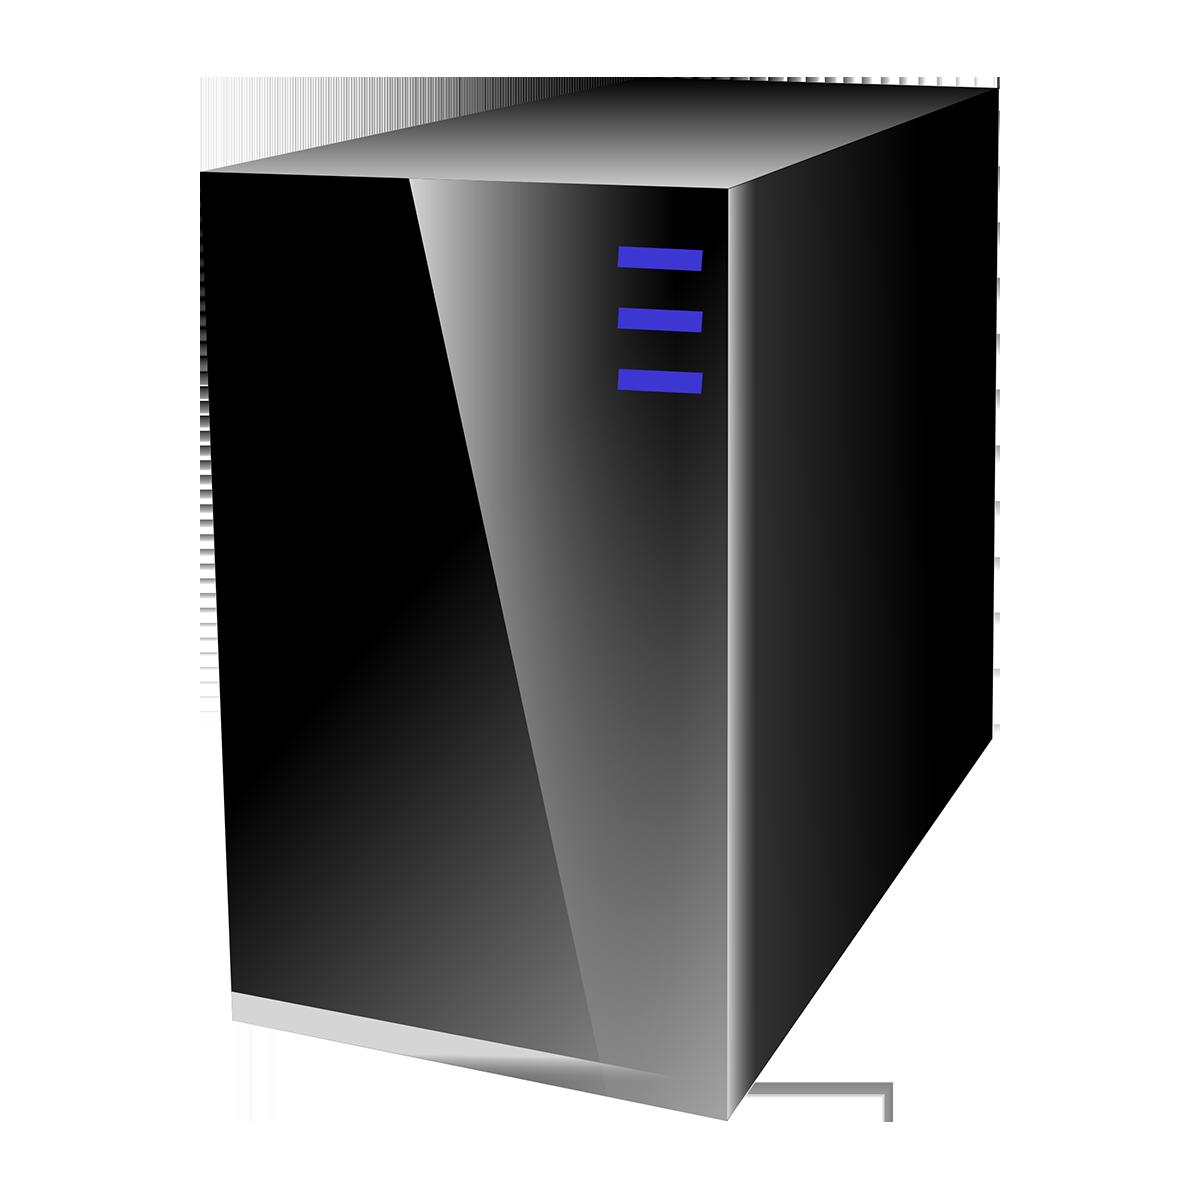 server-computer-case-drawing-ny